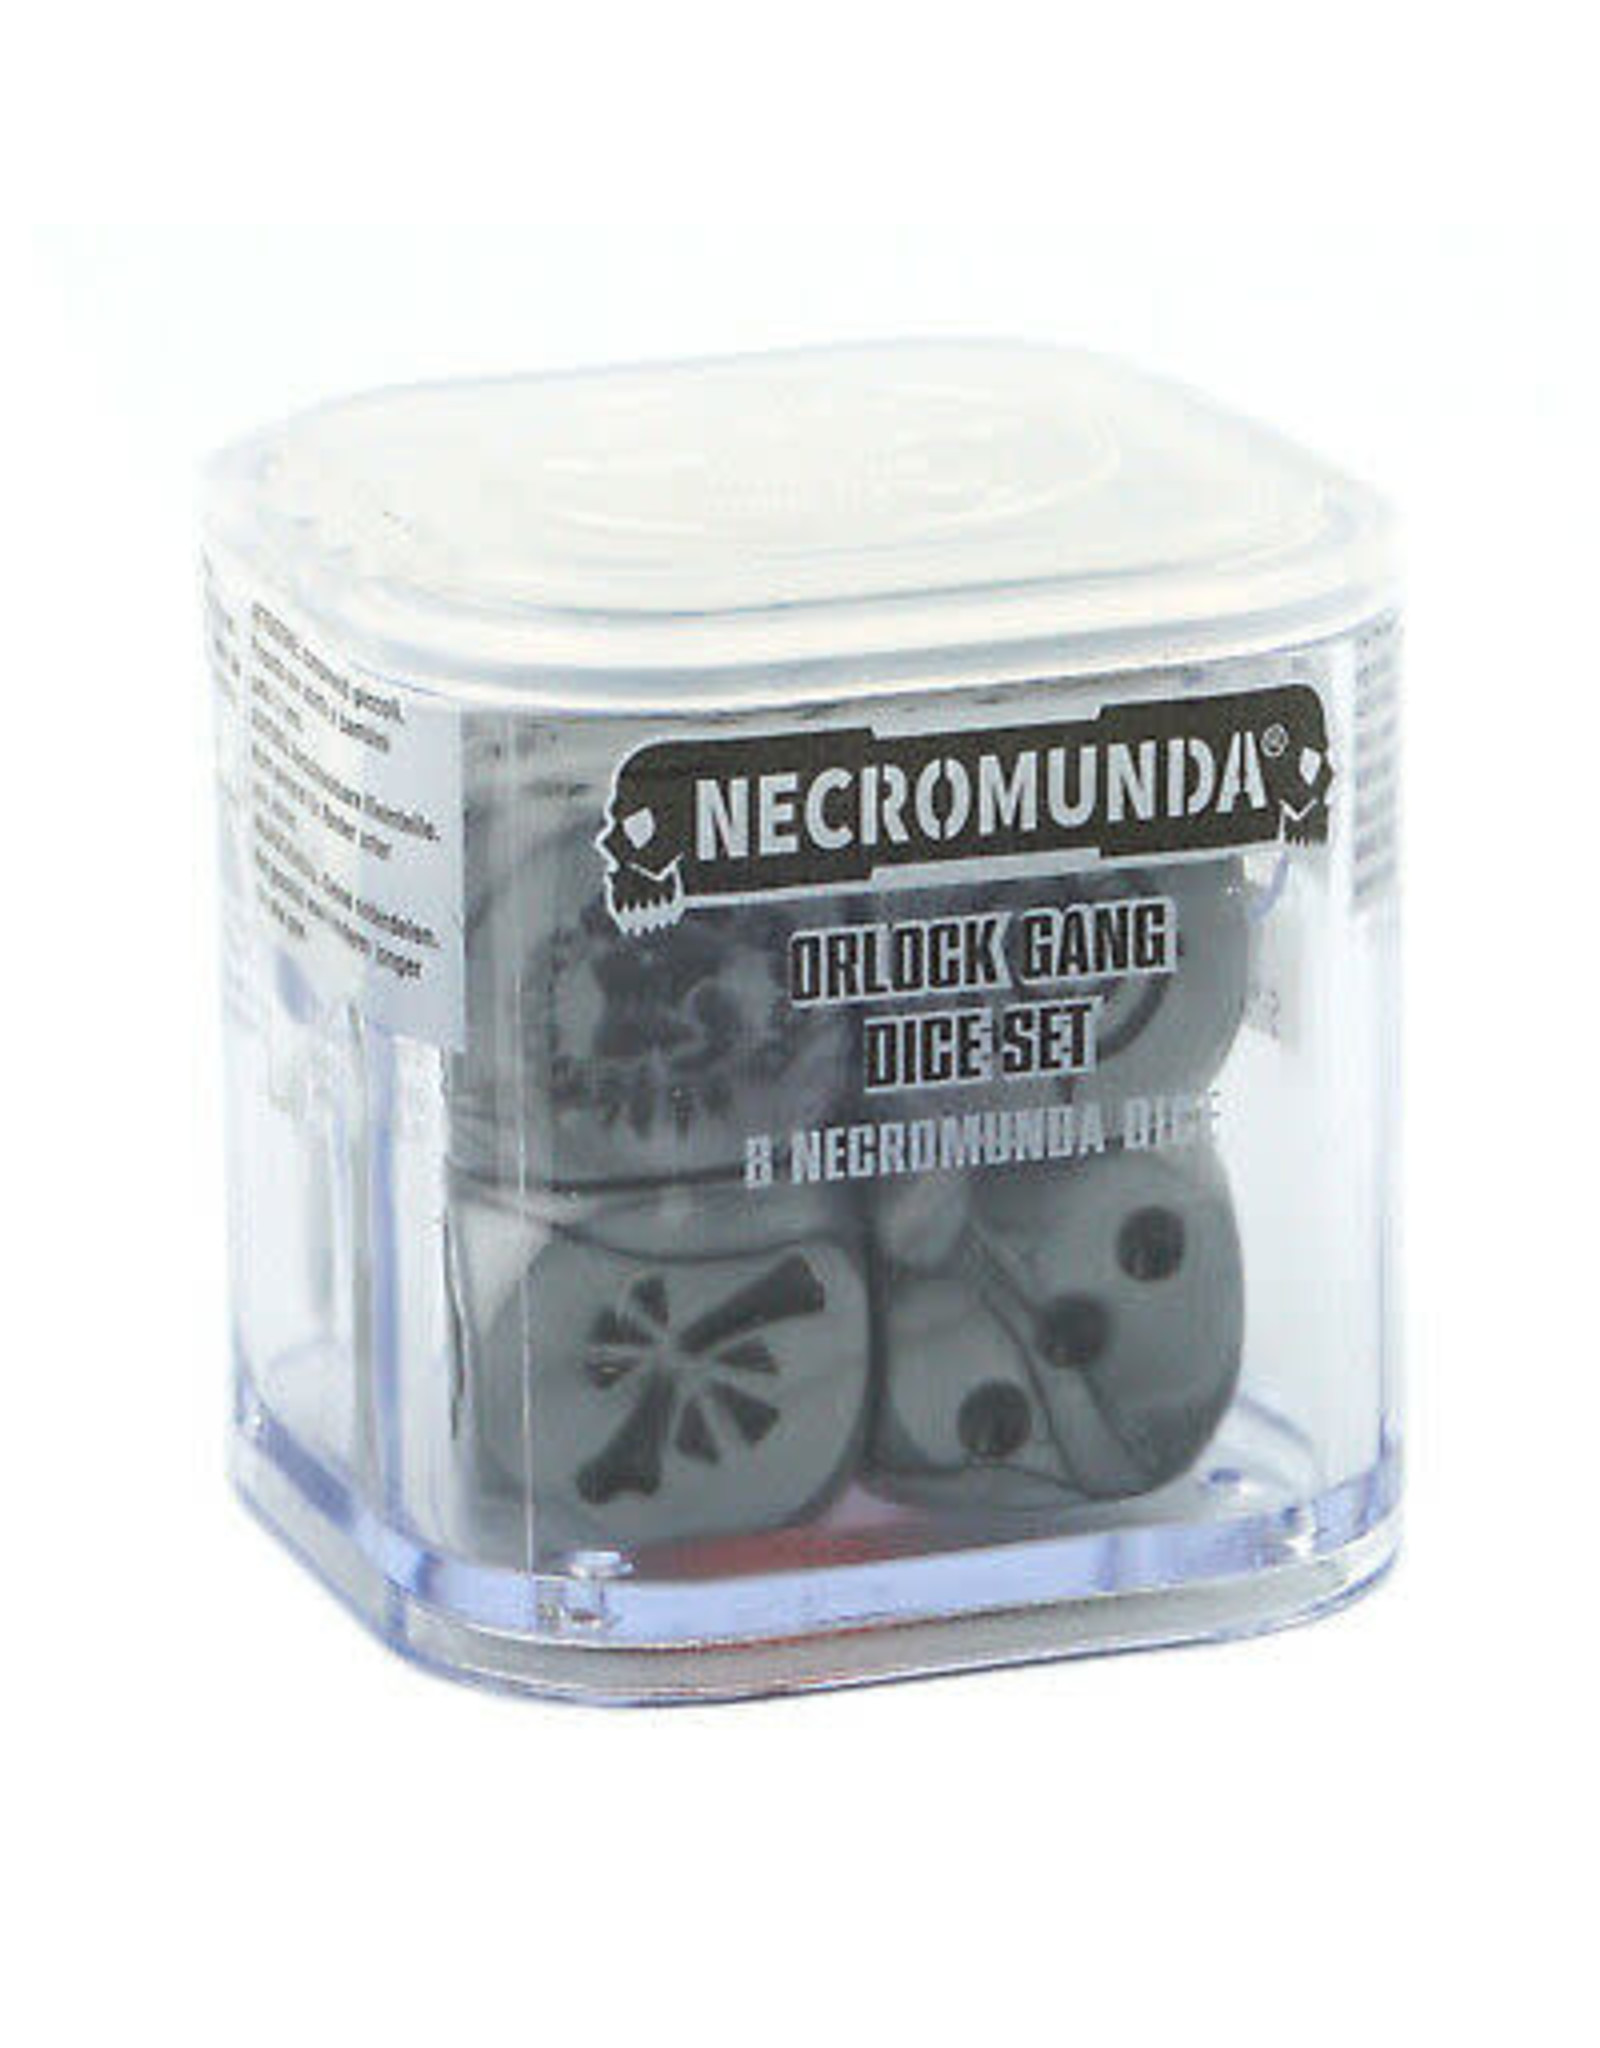 Citadel Necromunda Orlock Gang dice